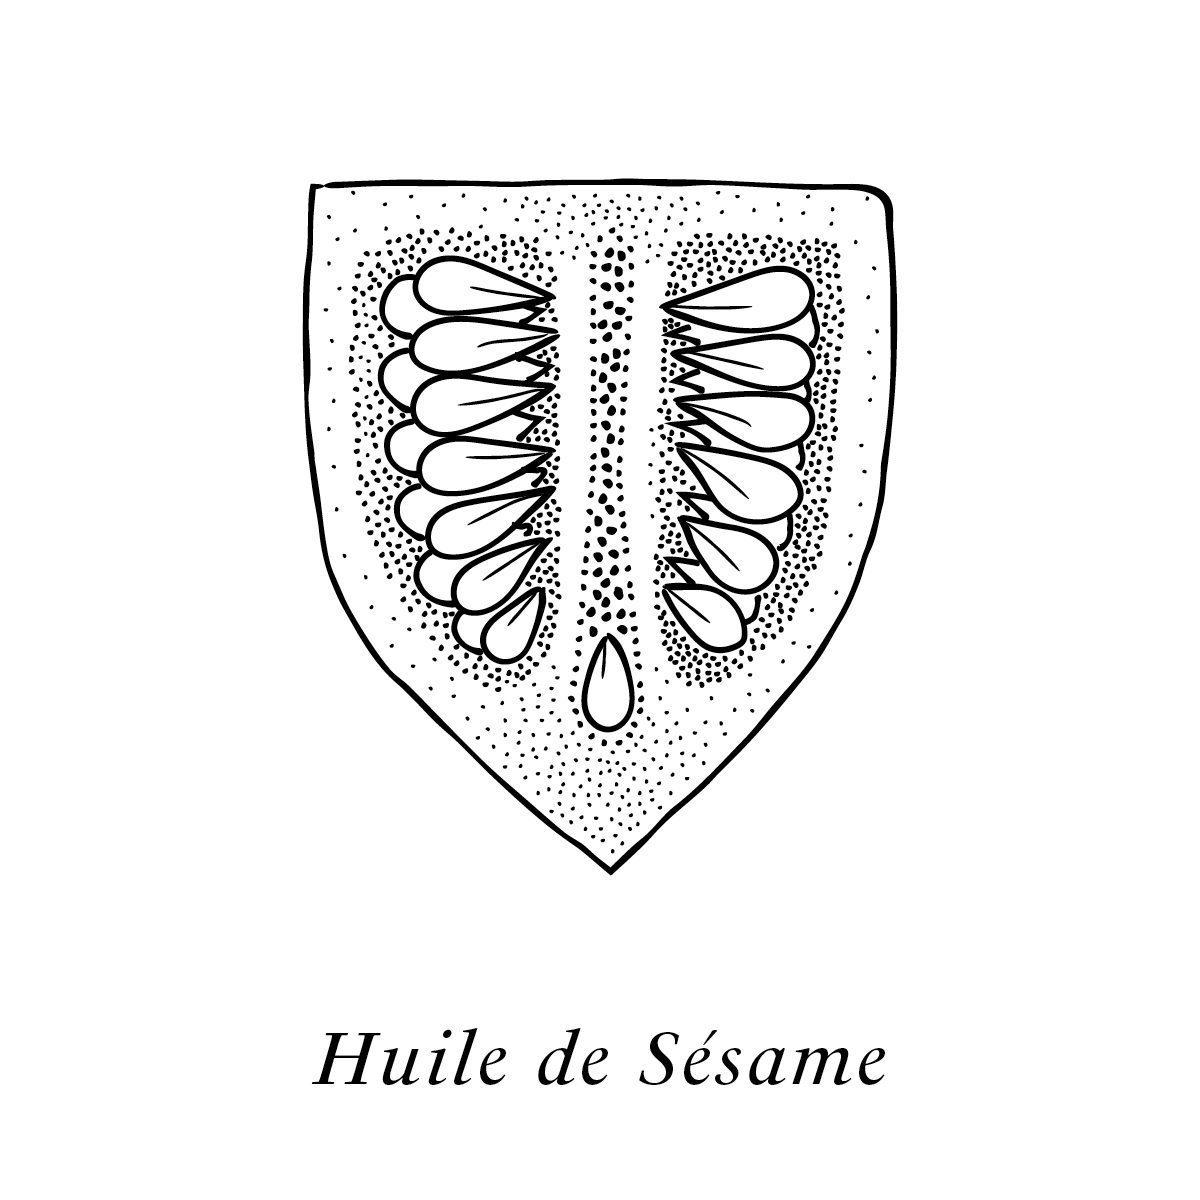 IchetKar illustre l'huile de sésame, un des actifs de la crème Claudius N°1, design ichetkar